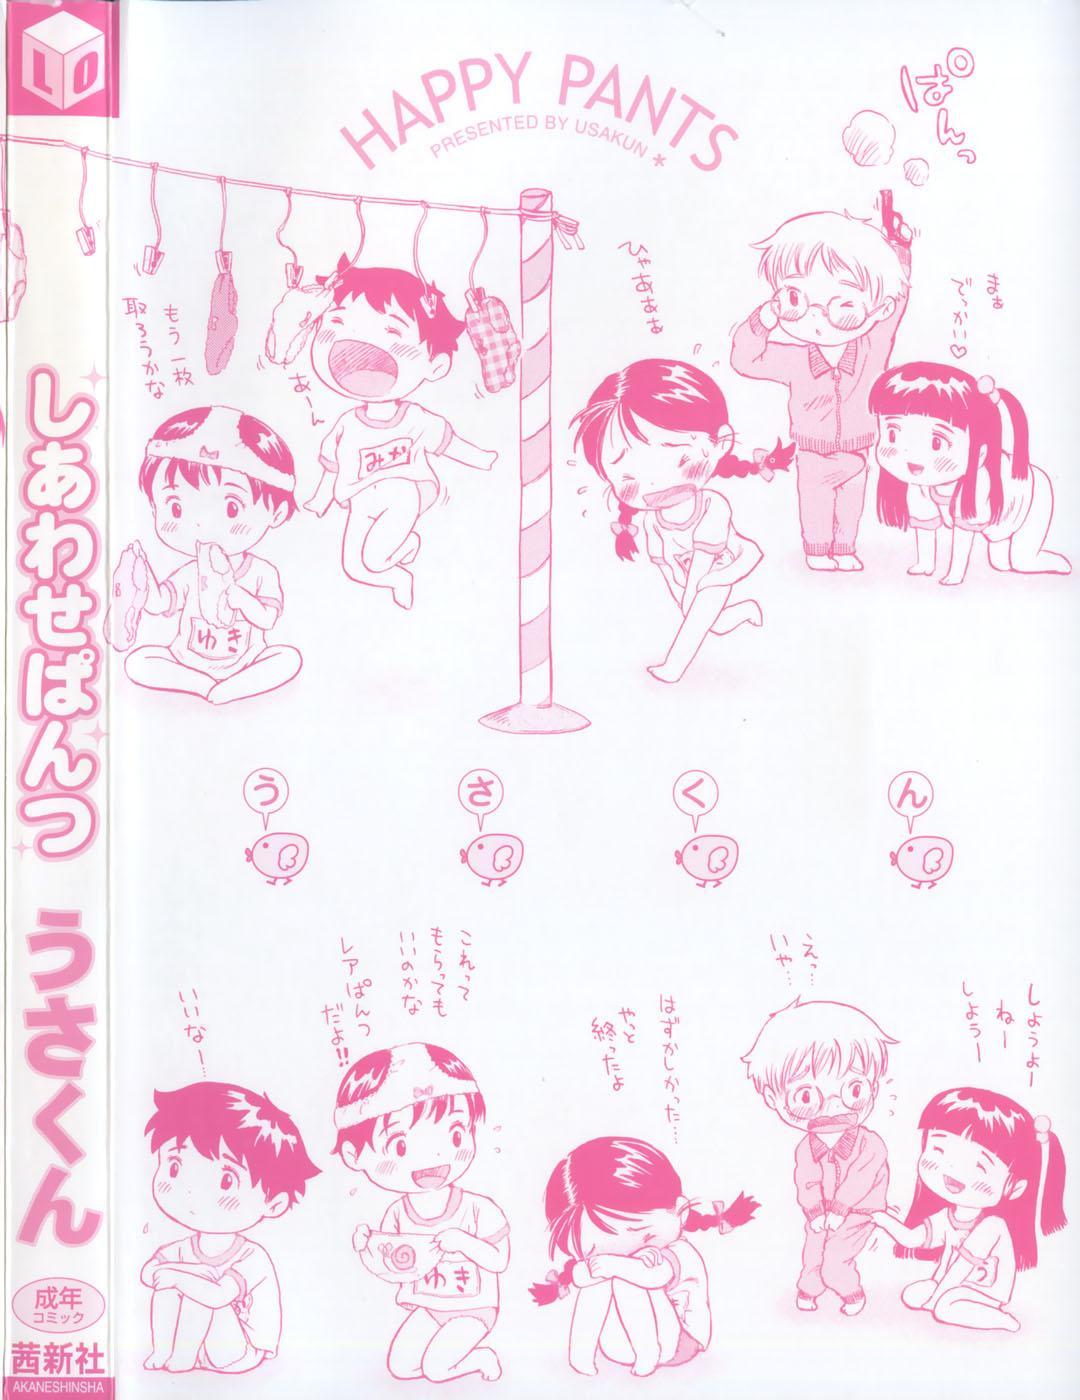 Shiawase Pants - Happy Pants 5